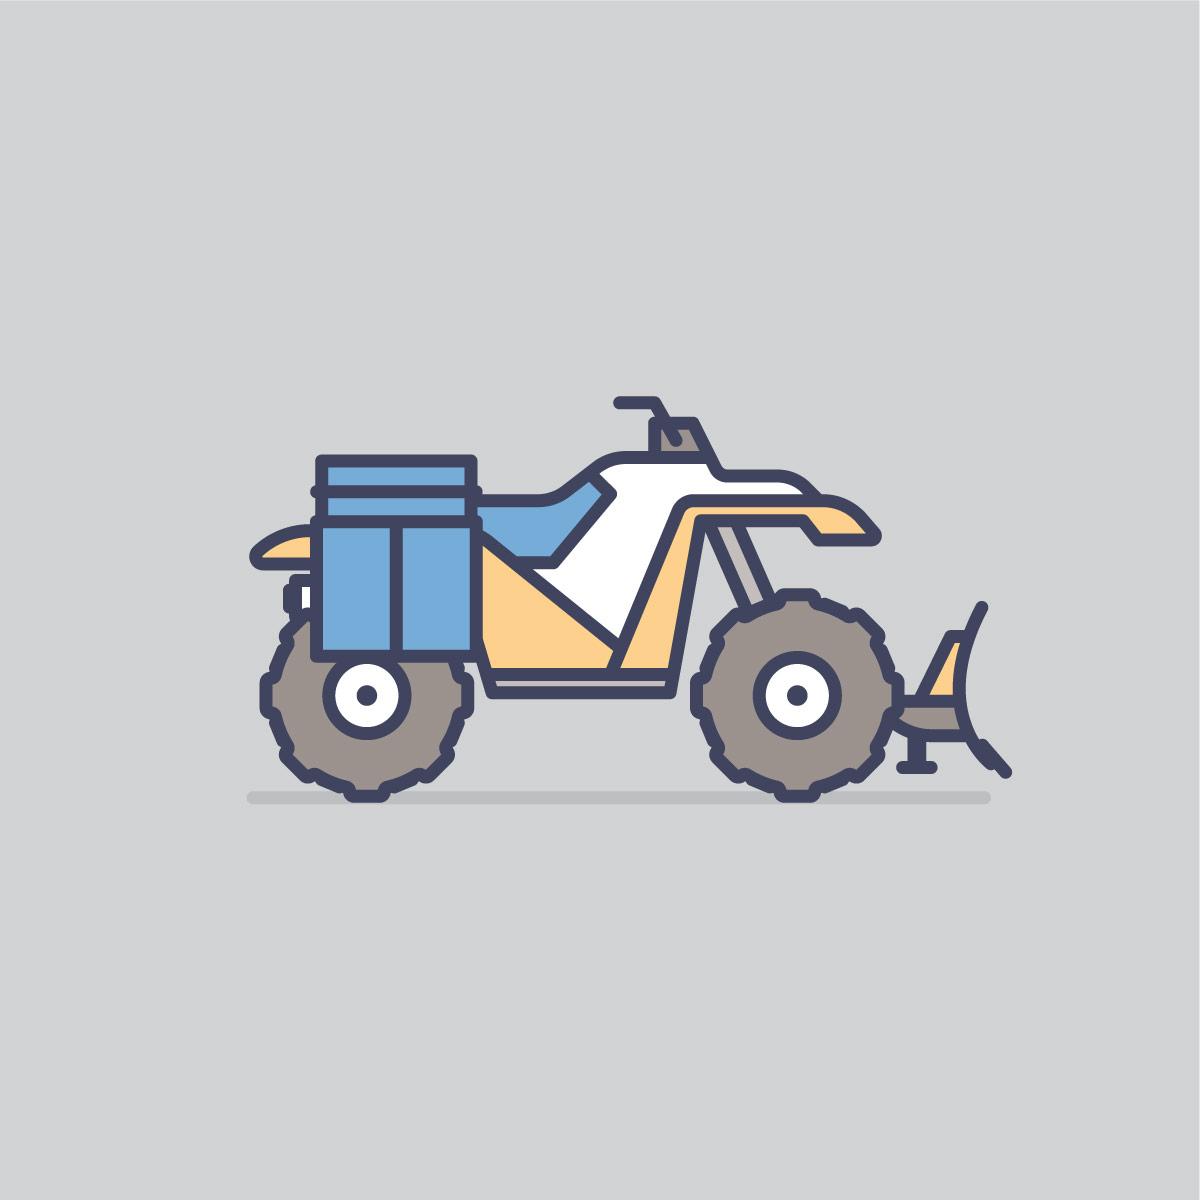 Top 5 DIY ATV improvements.